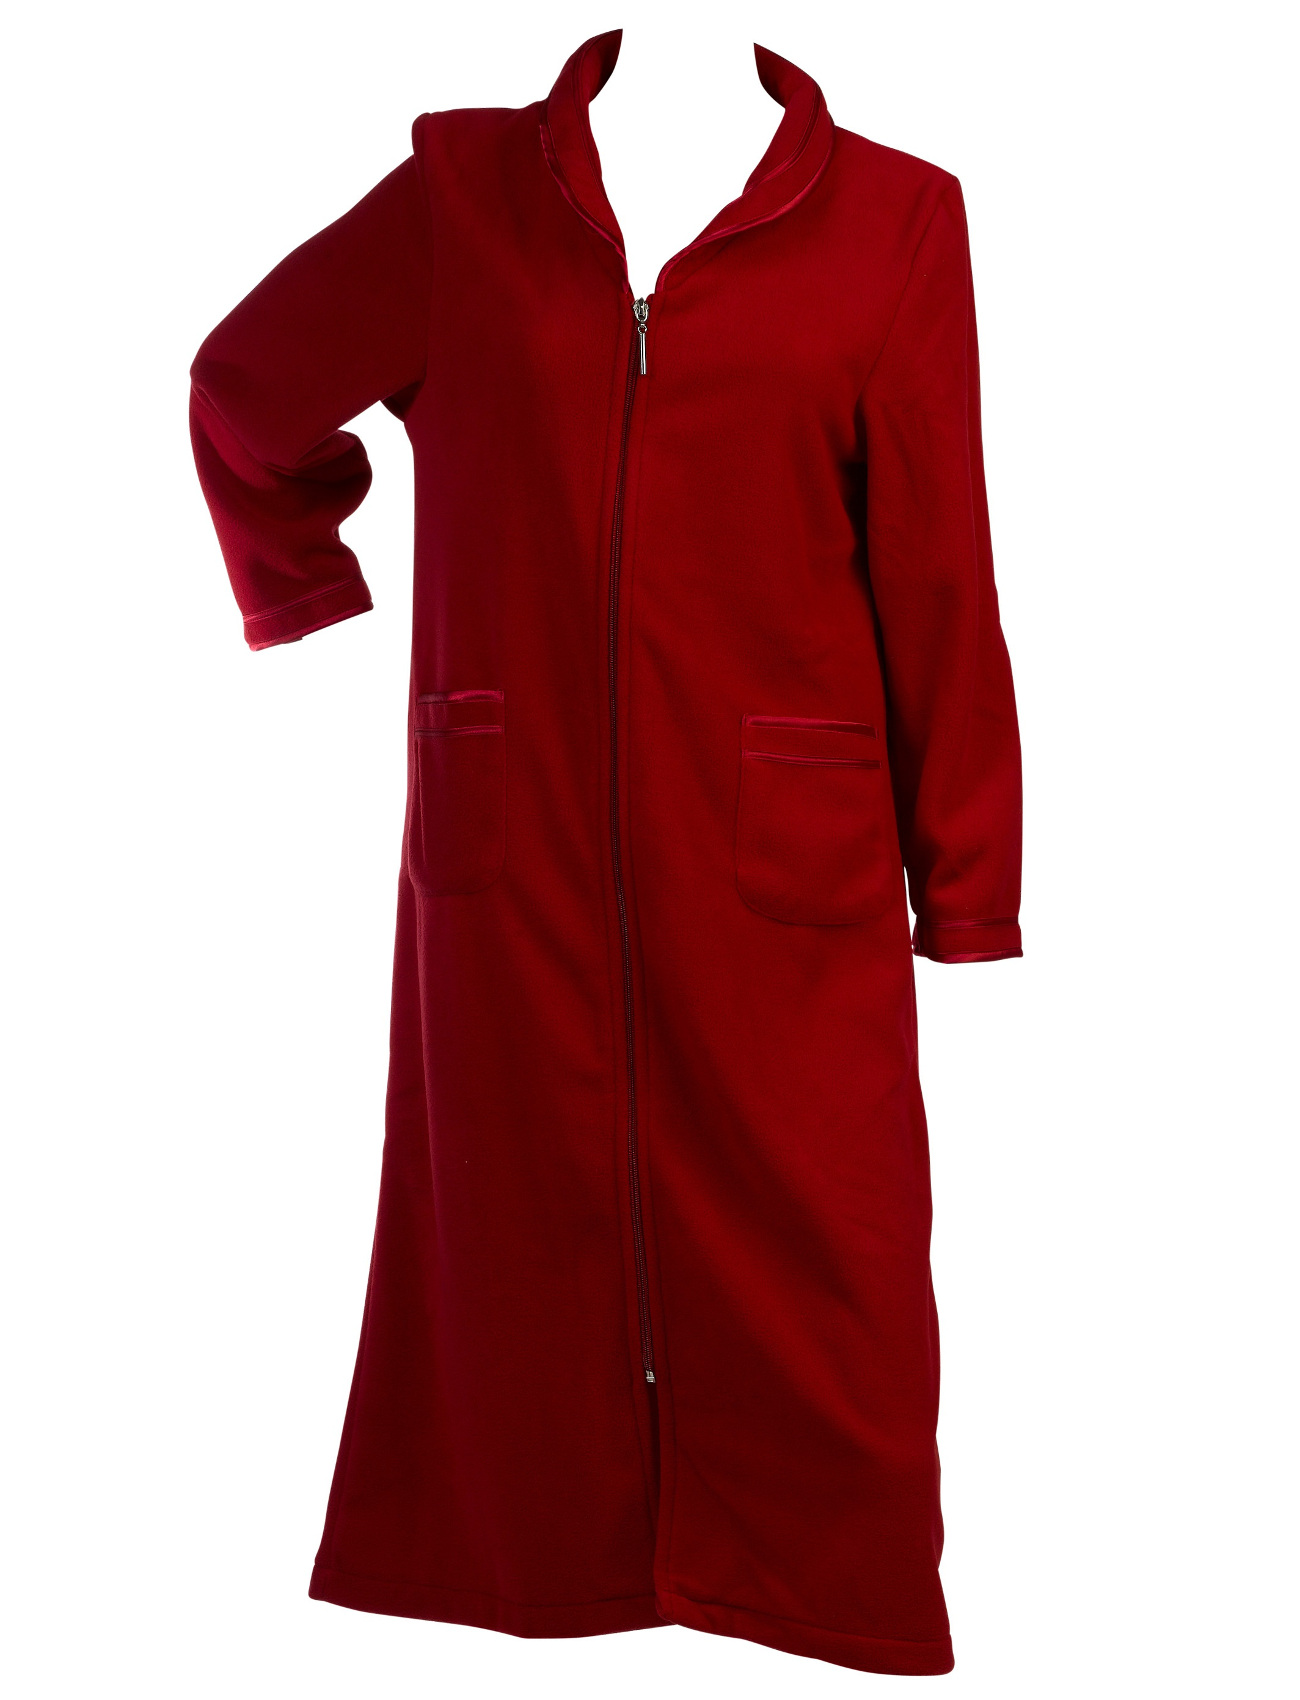 fa1018e265 Dressing Gown Womens Zip Up Anti Pill Fleece Slenderella Satin Trim Bathrobe